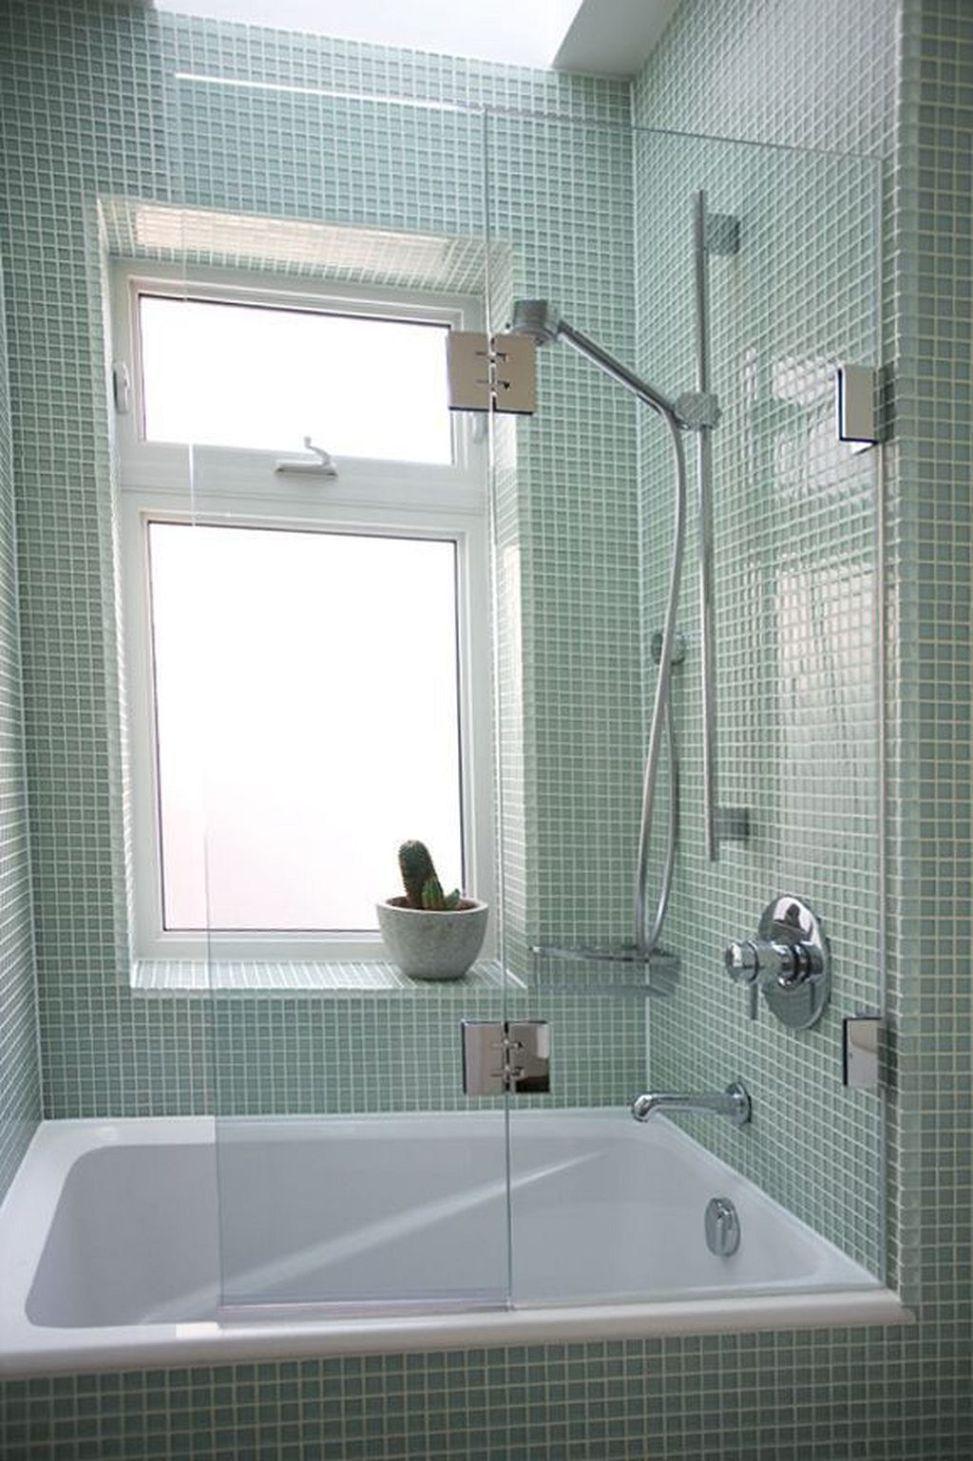 Double Panel Tub Screen Bathroom Tub Shower Combo Bathroom Tub